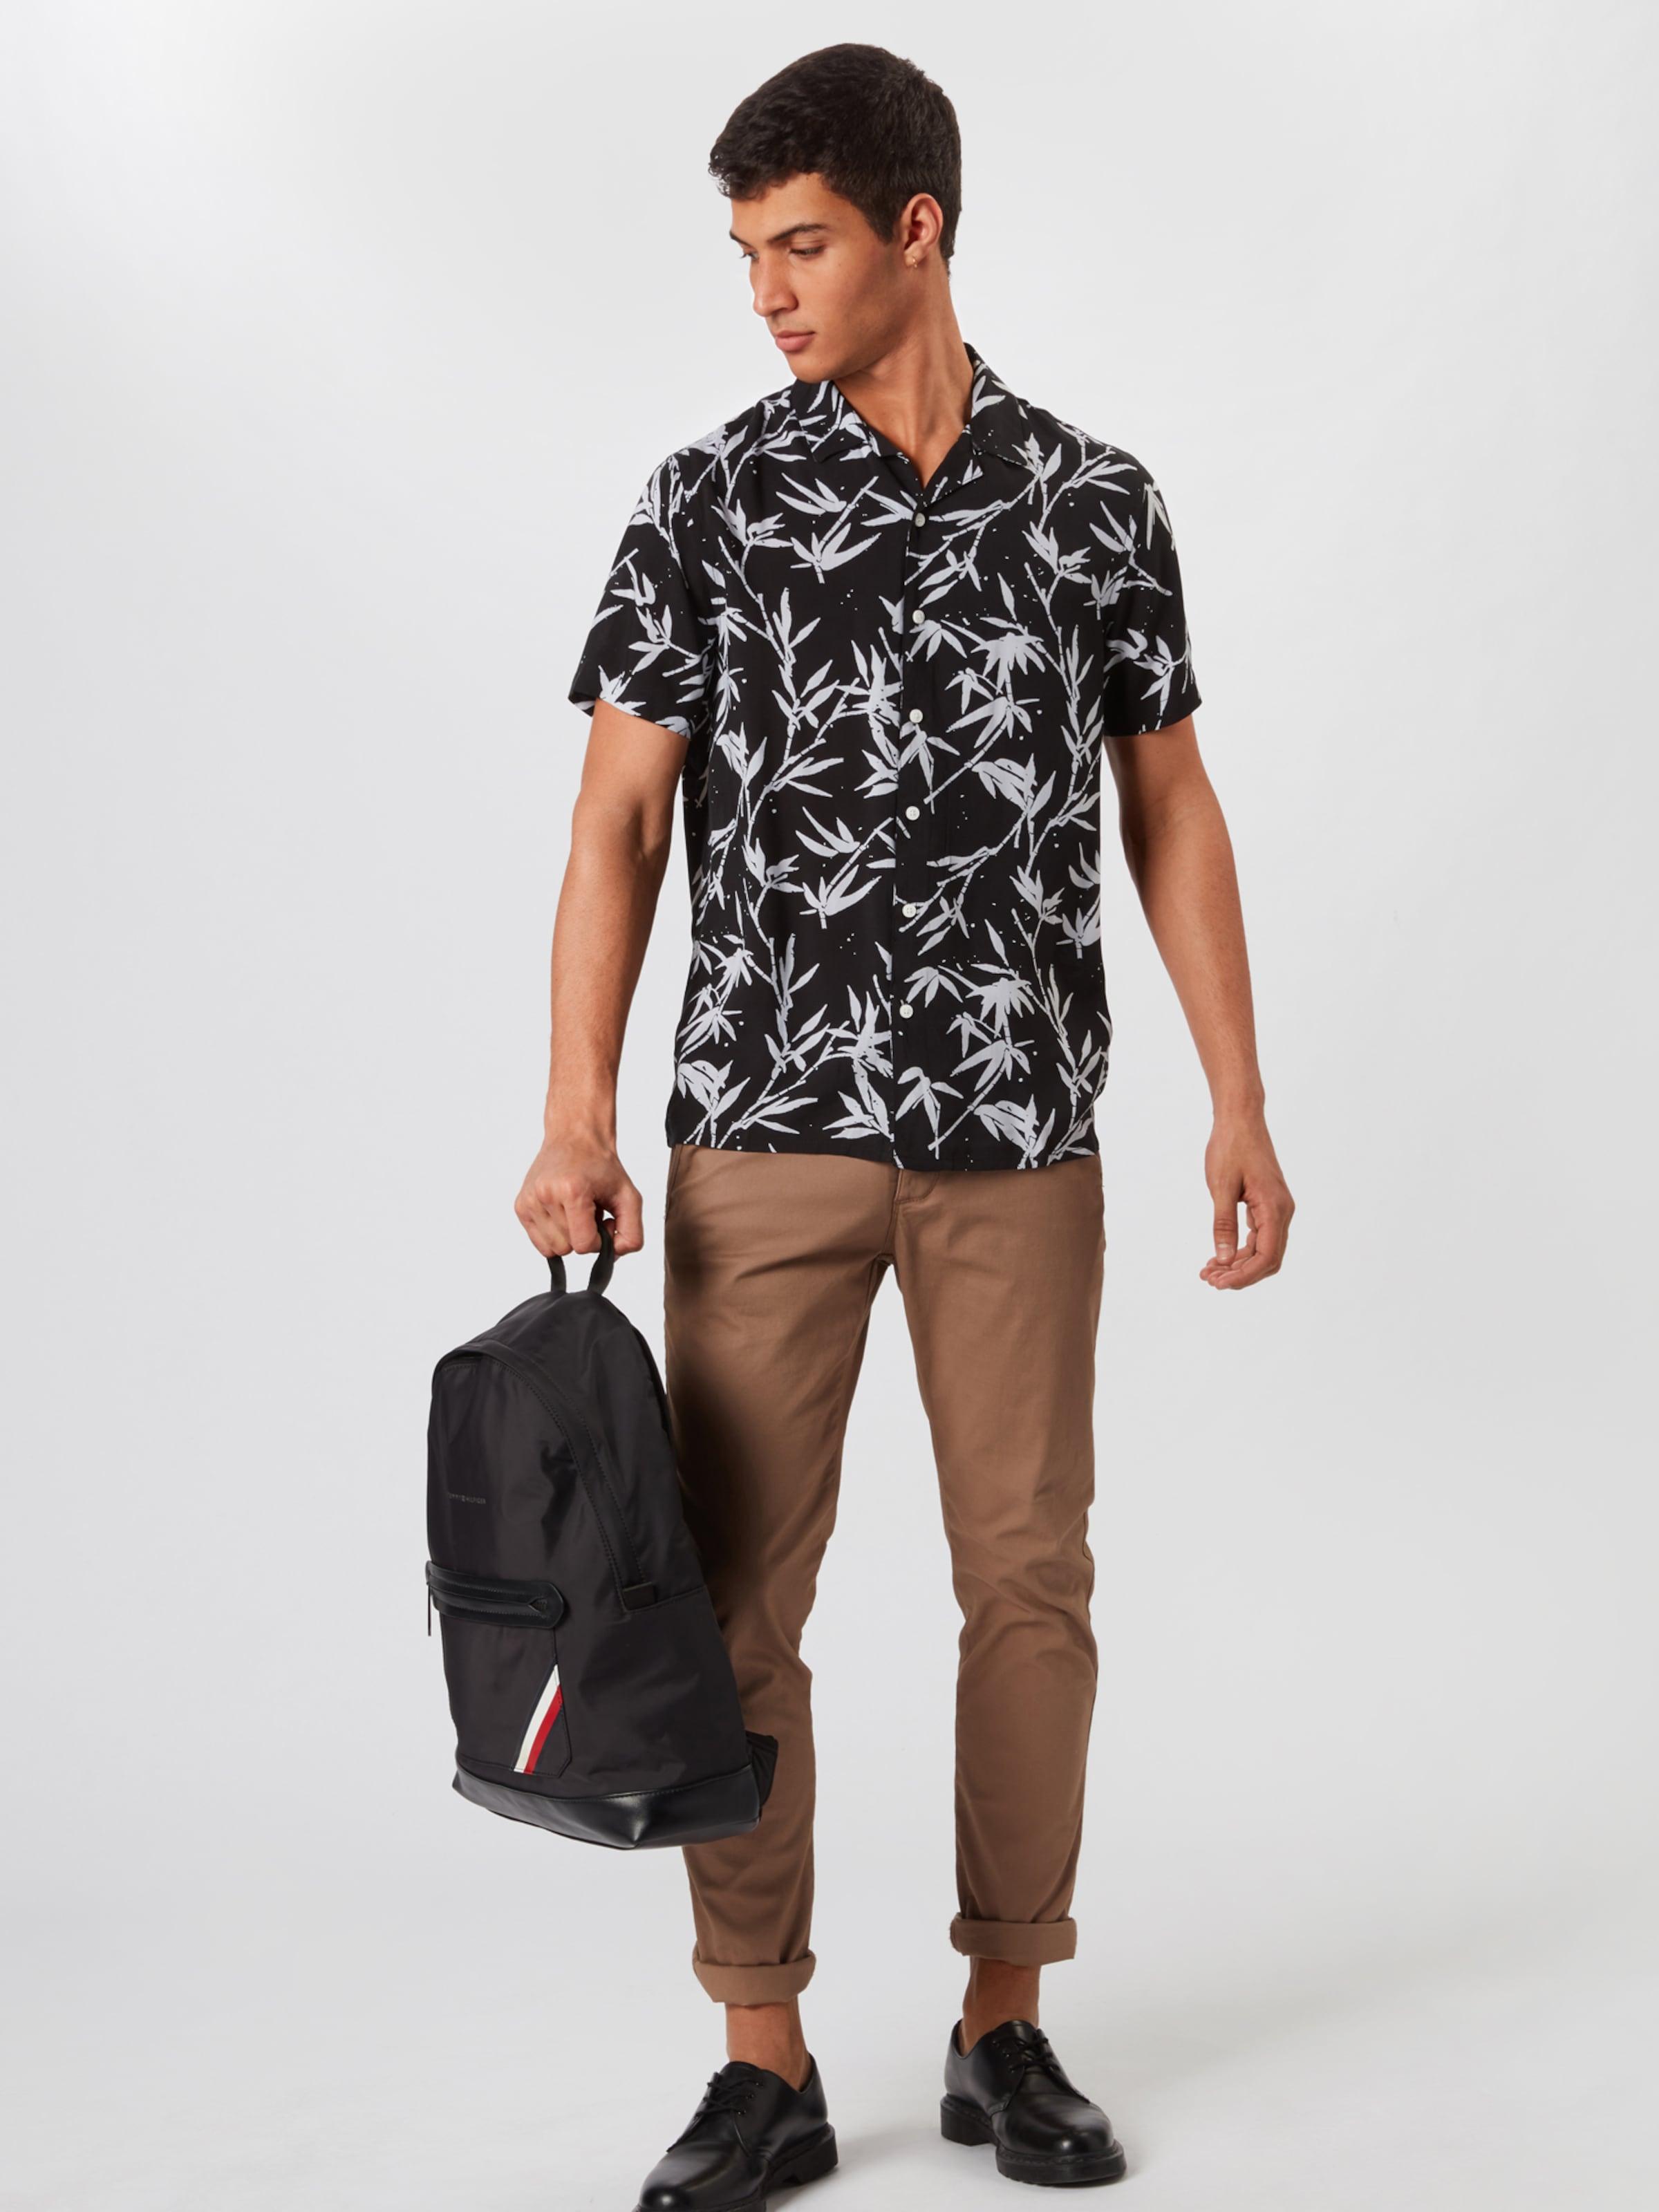 New KhakiSchwarz Look New Hemd In 8P0nXNOZwk